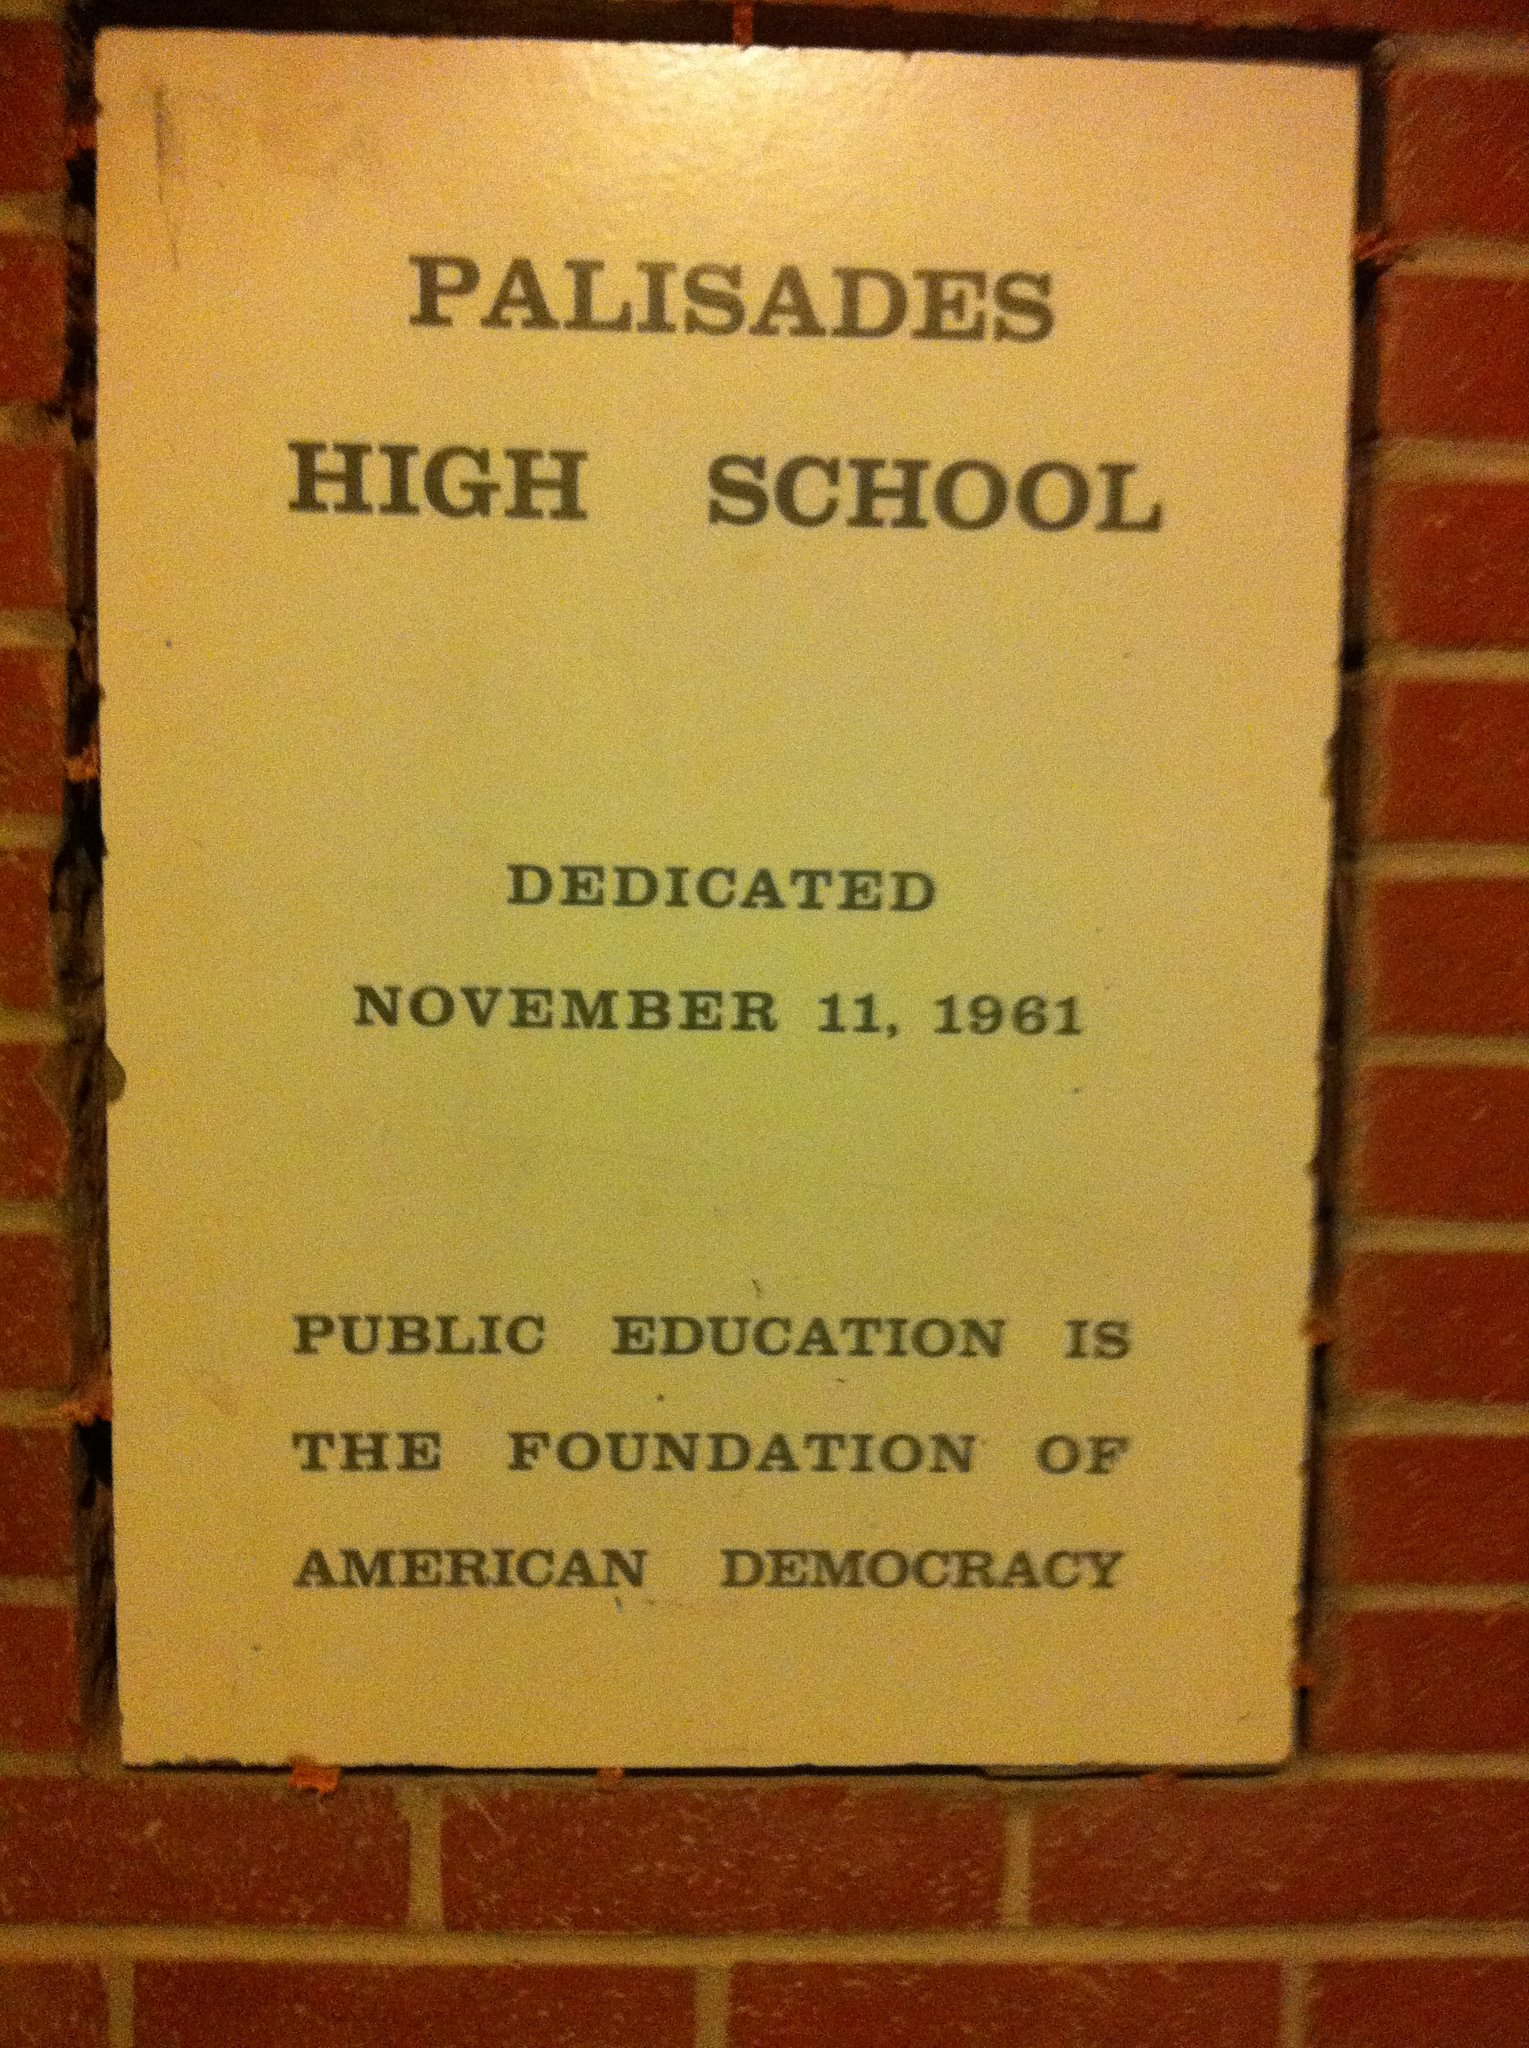 2012-01-22-images-PublicEducationPlaque.jpg